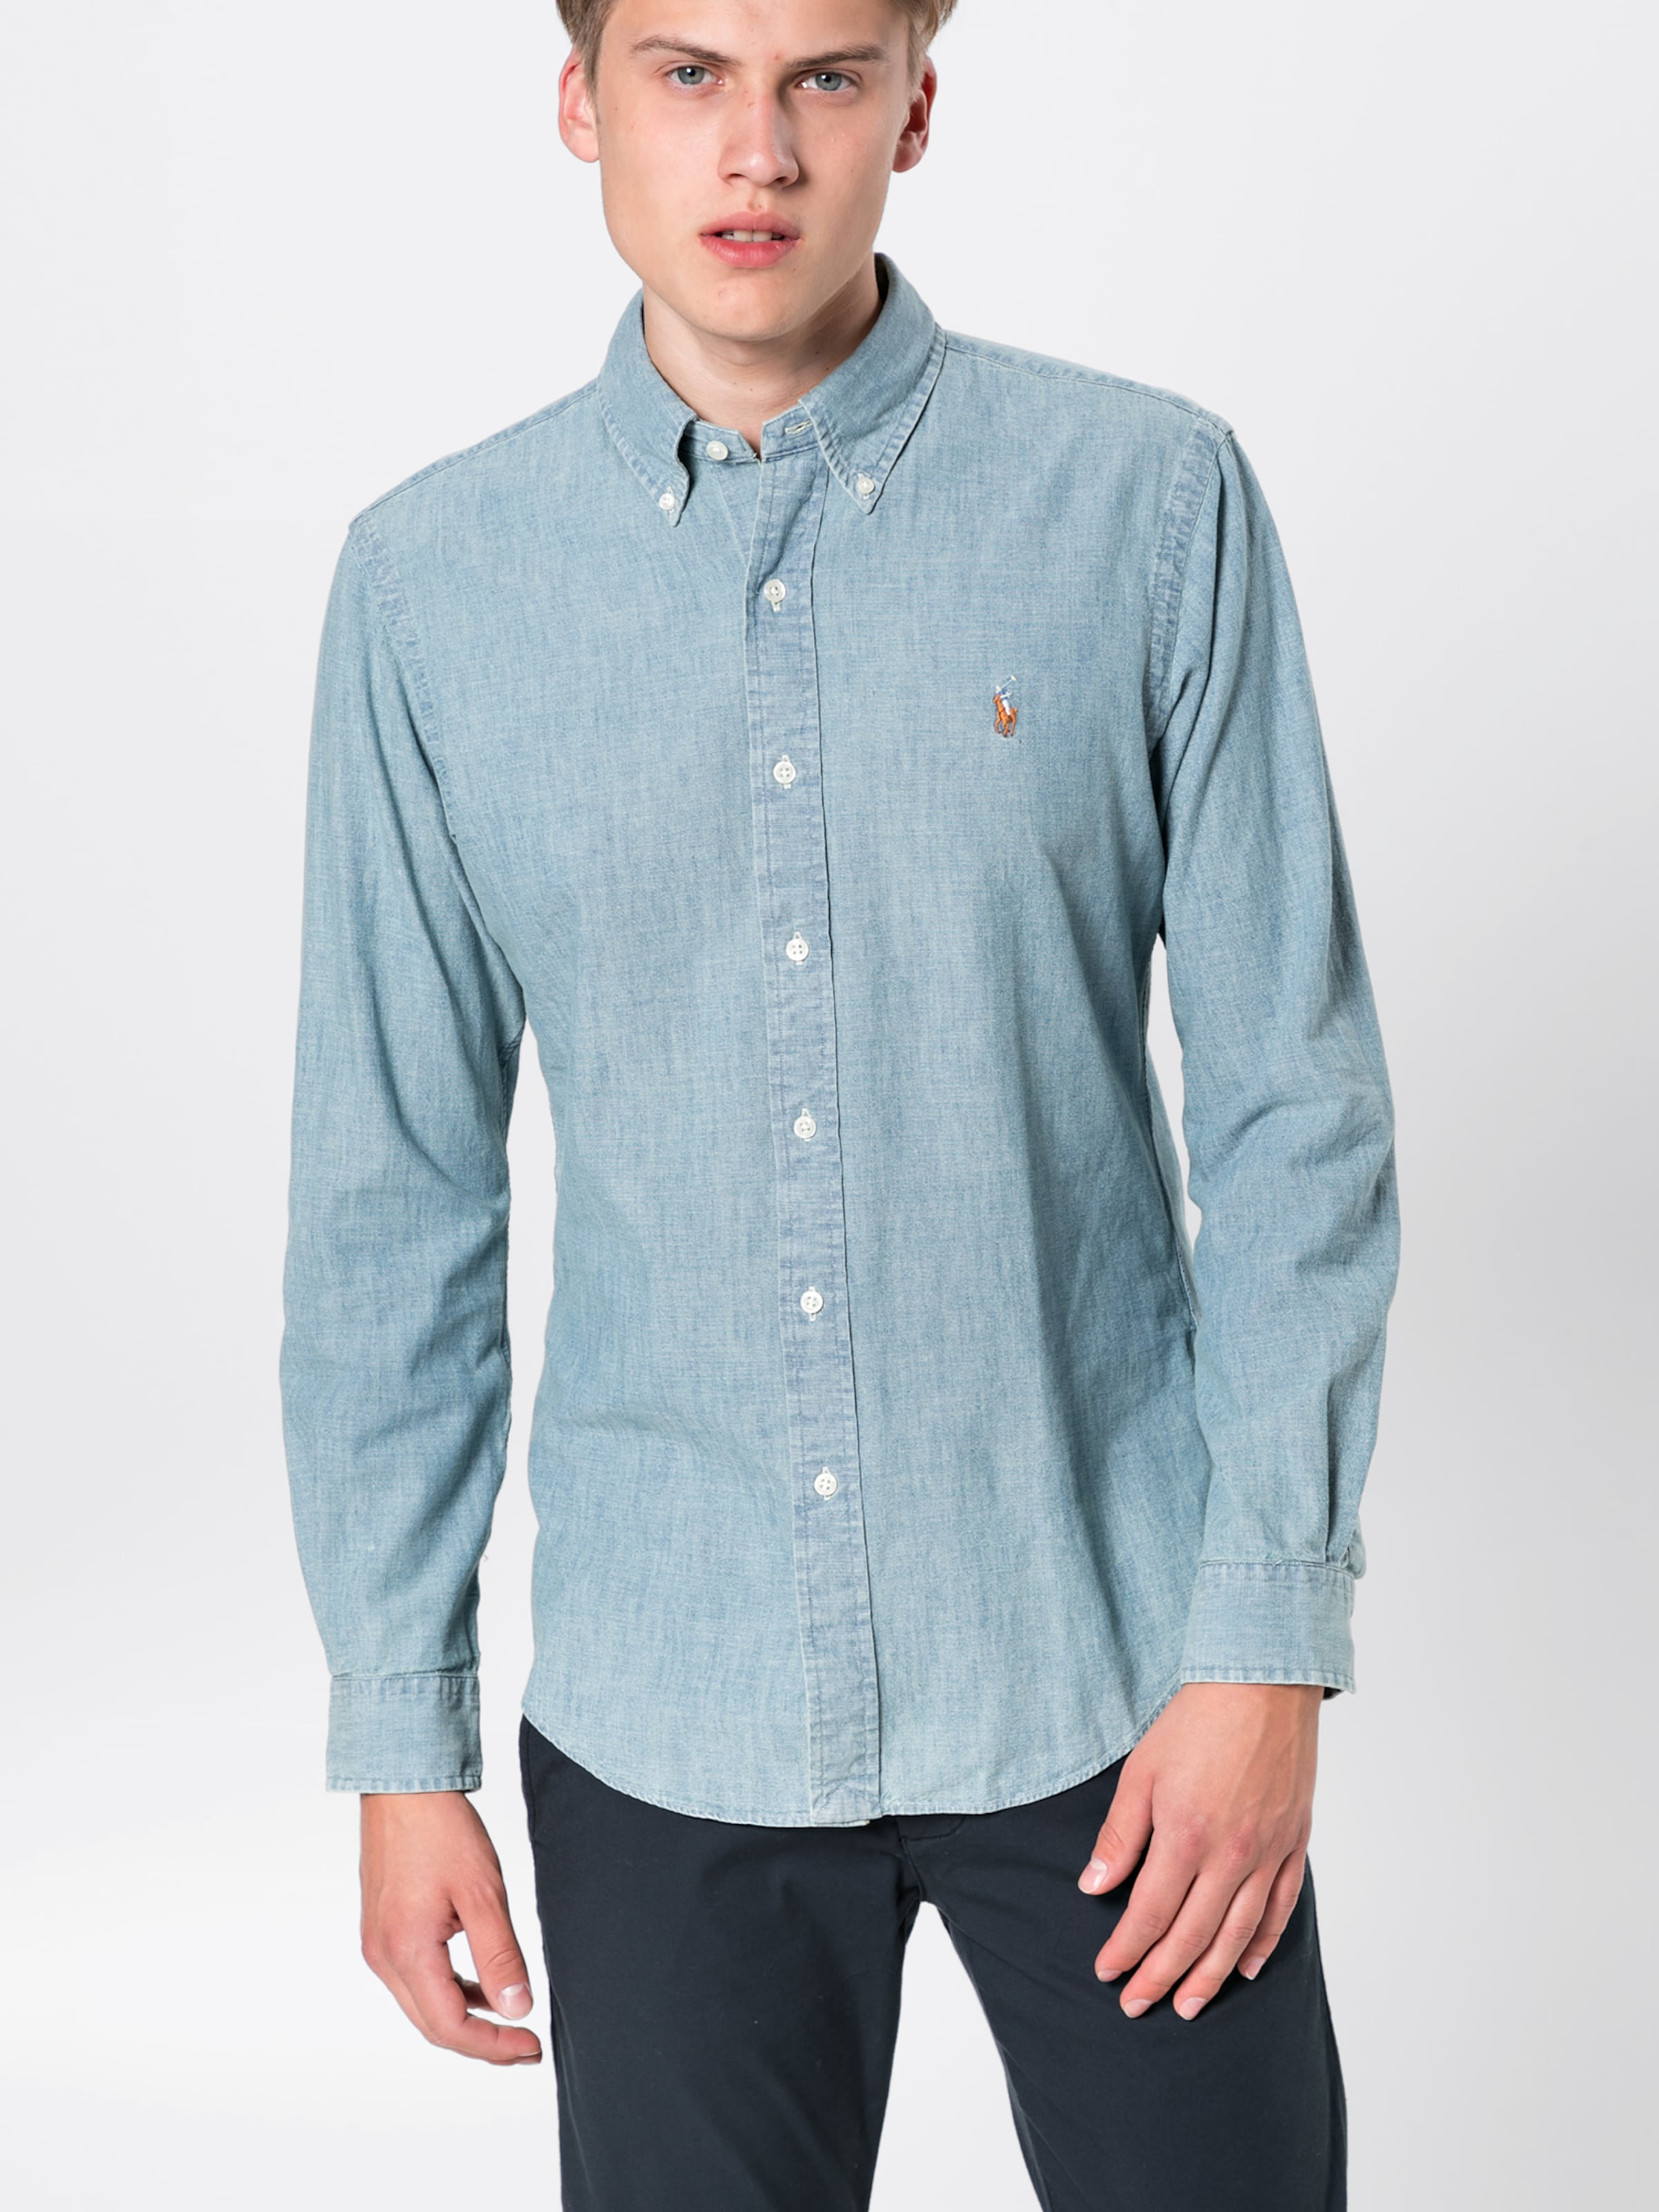 Blue Denim 'sl long Hemd Sp Ppc sport Lauren Shirt' In Sleeve Ralph Polo Bd CoeWBdrx